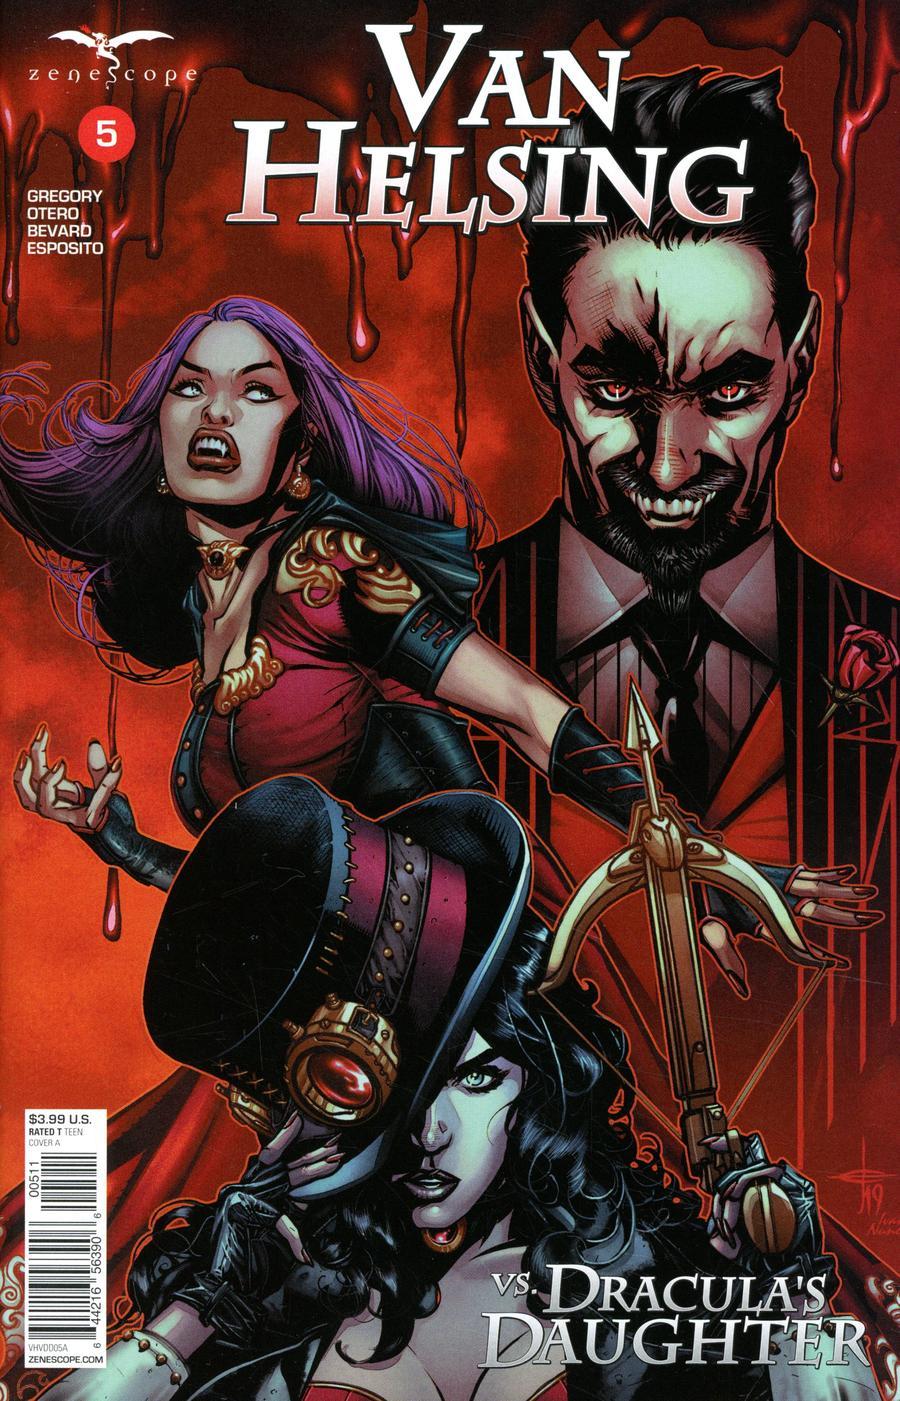 Grimm Fairy Tales Presents Van Helsing vs Draculas Daughter #5 Cover A Drew Edward Johnson